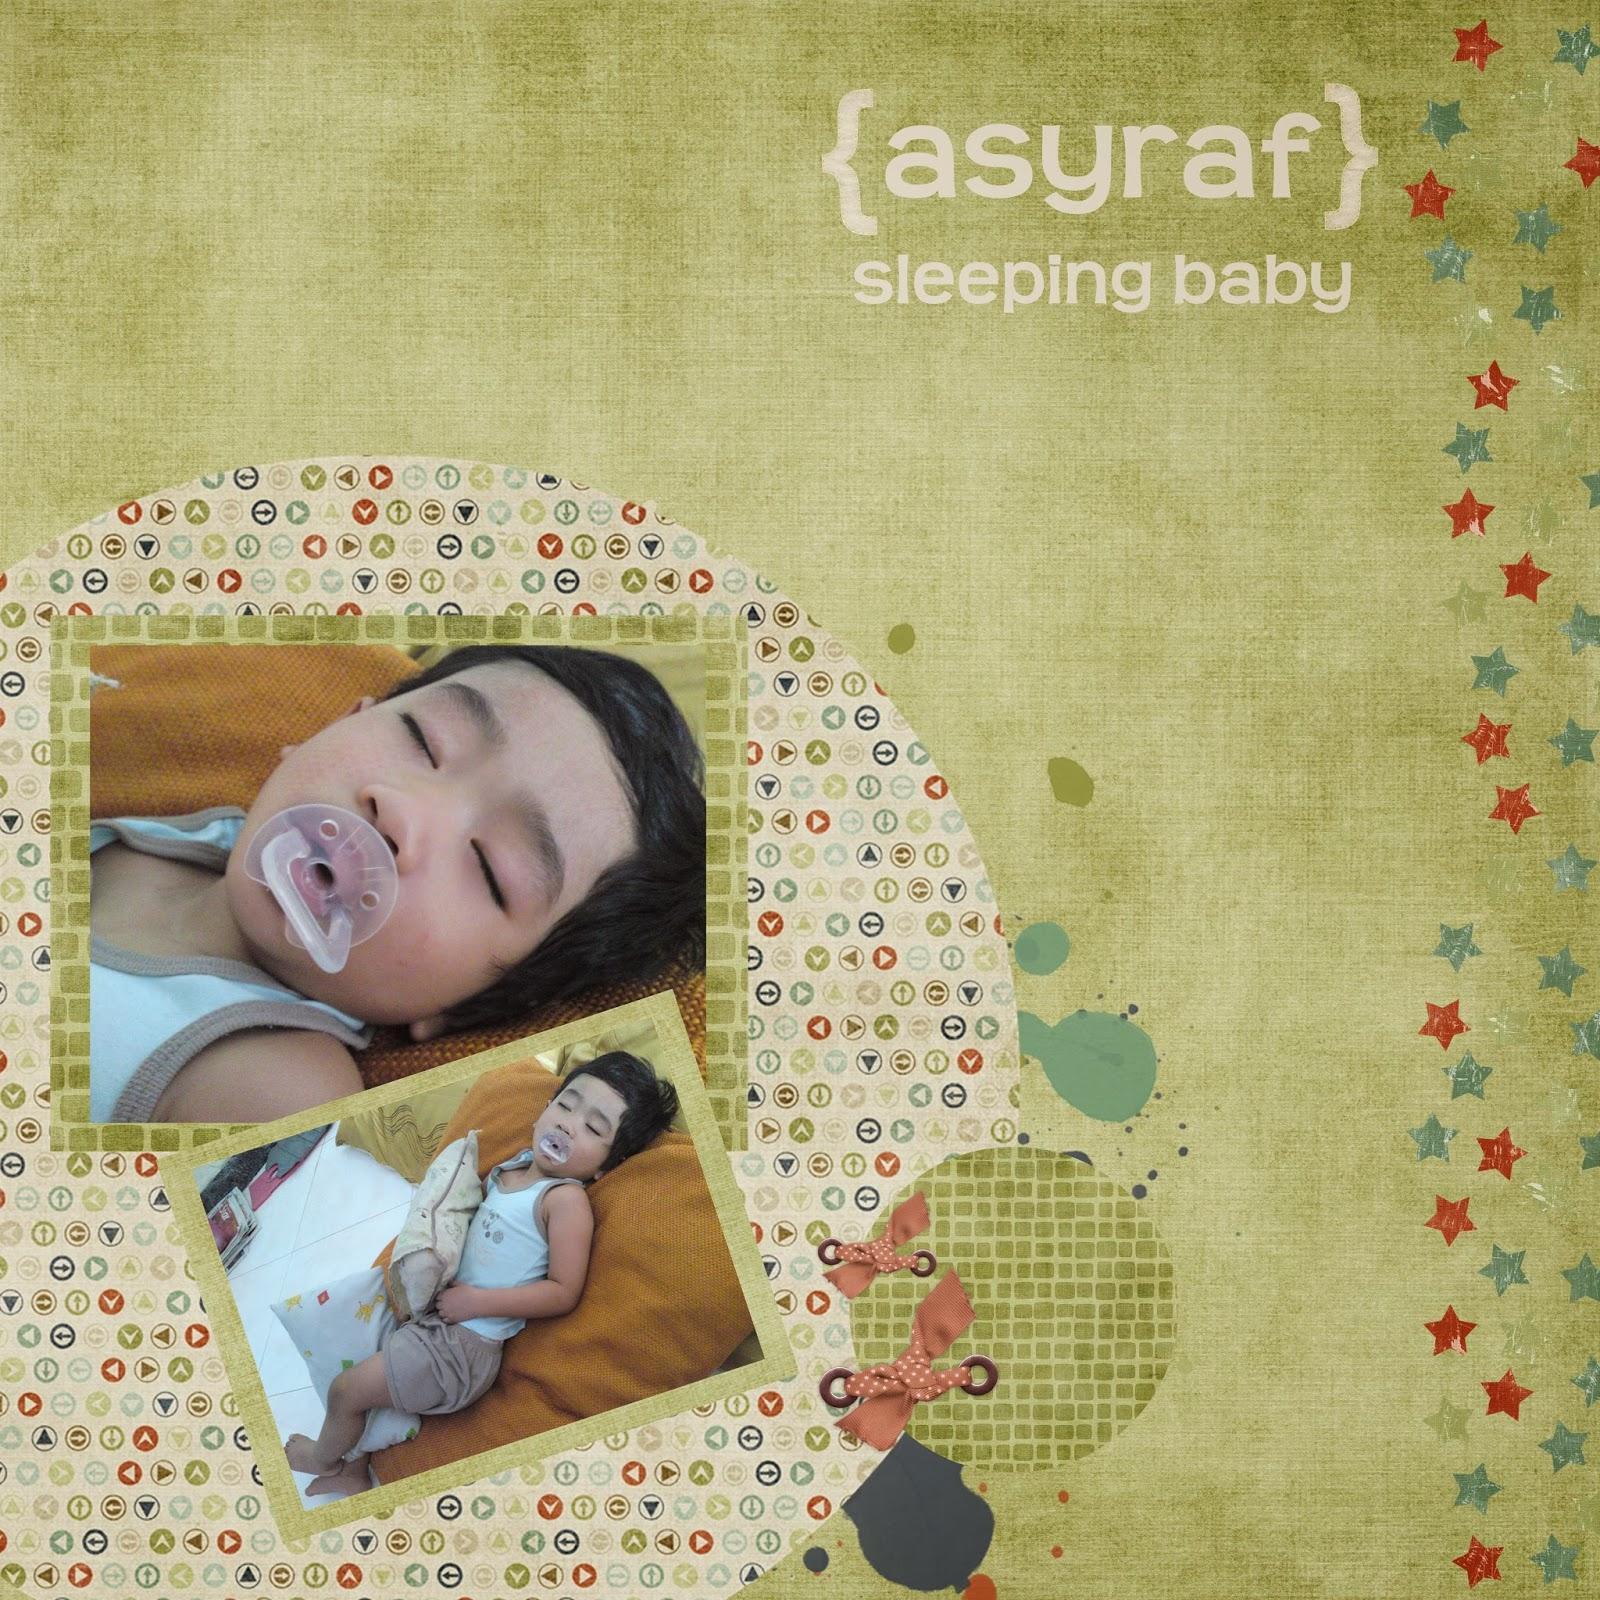 Asyraf tidur dengan nyenyaknya